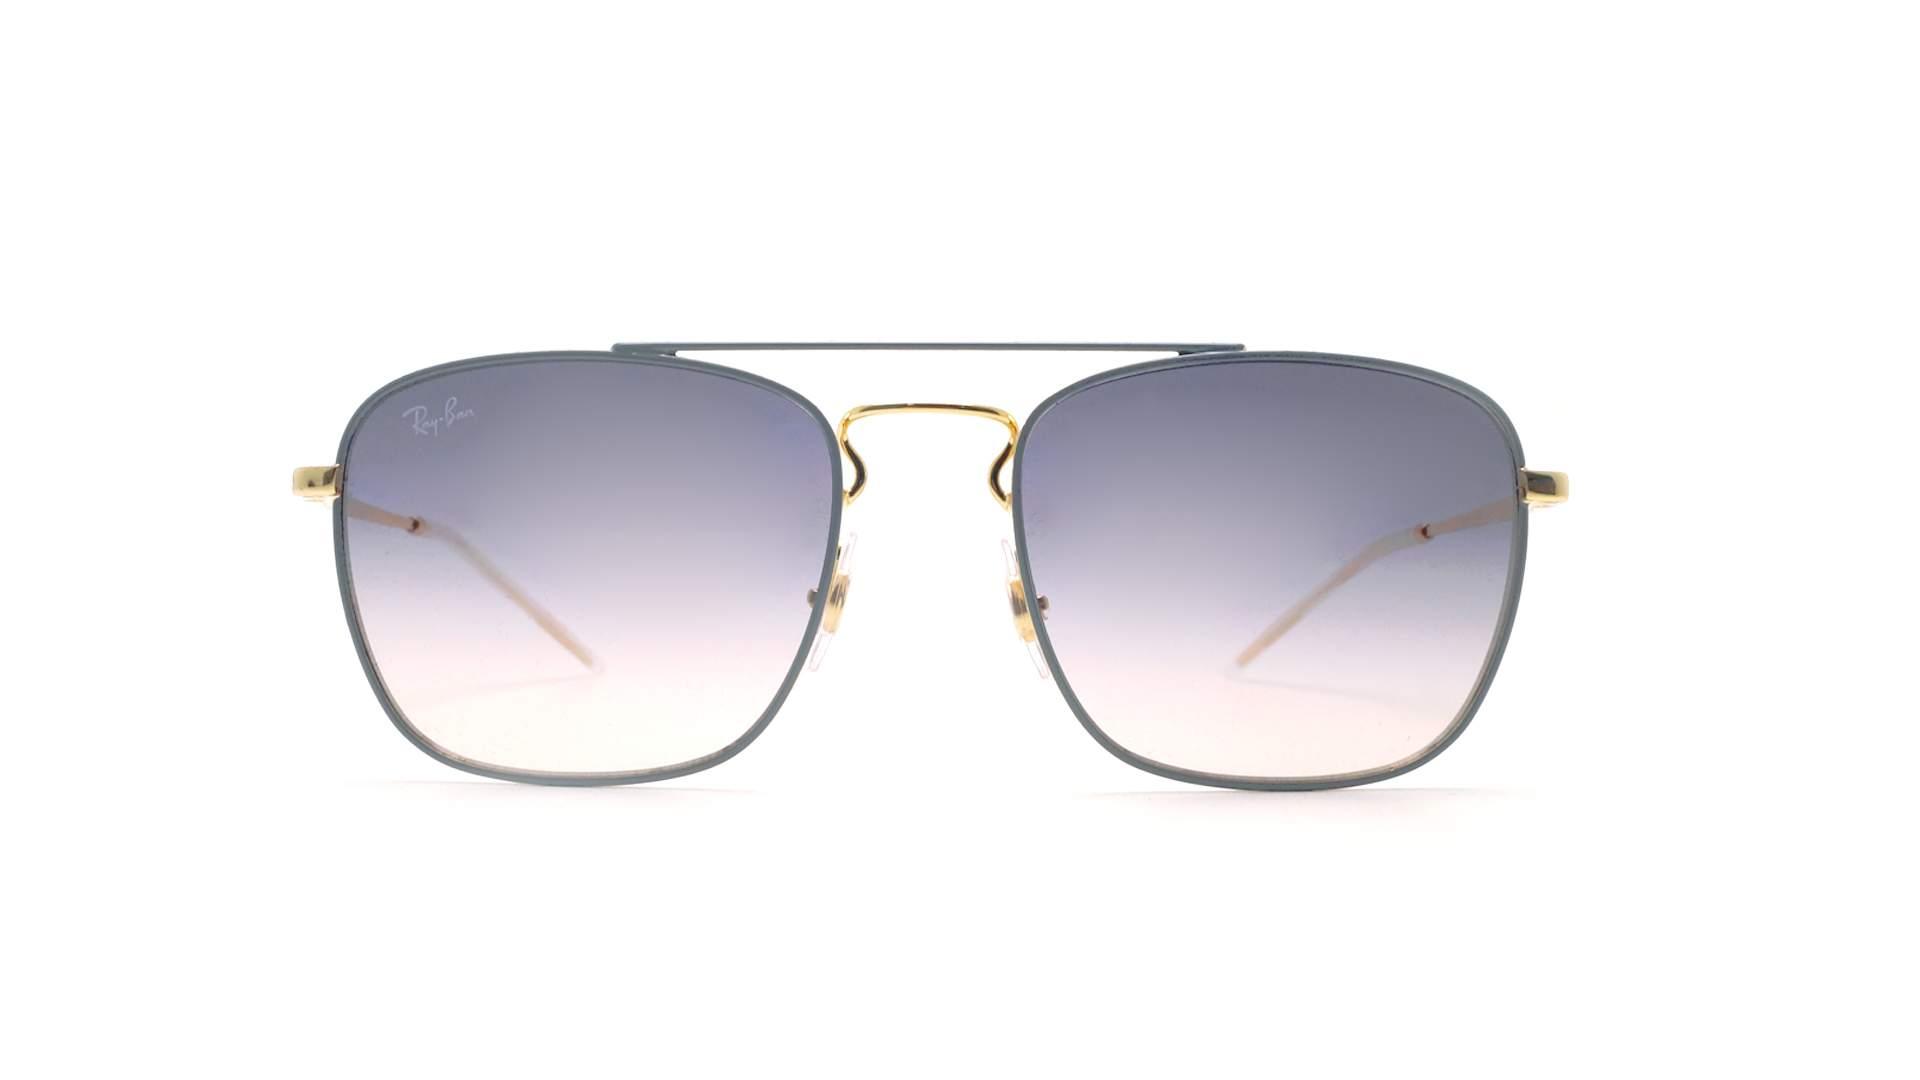 c23851dcef5 Sunglasses Ray-Ban RB3588 9063 I9 55-19 Grey Medium Gradient